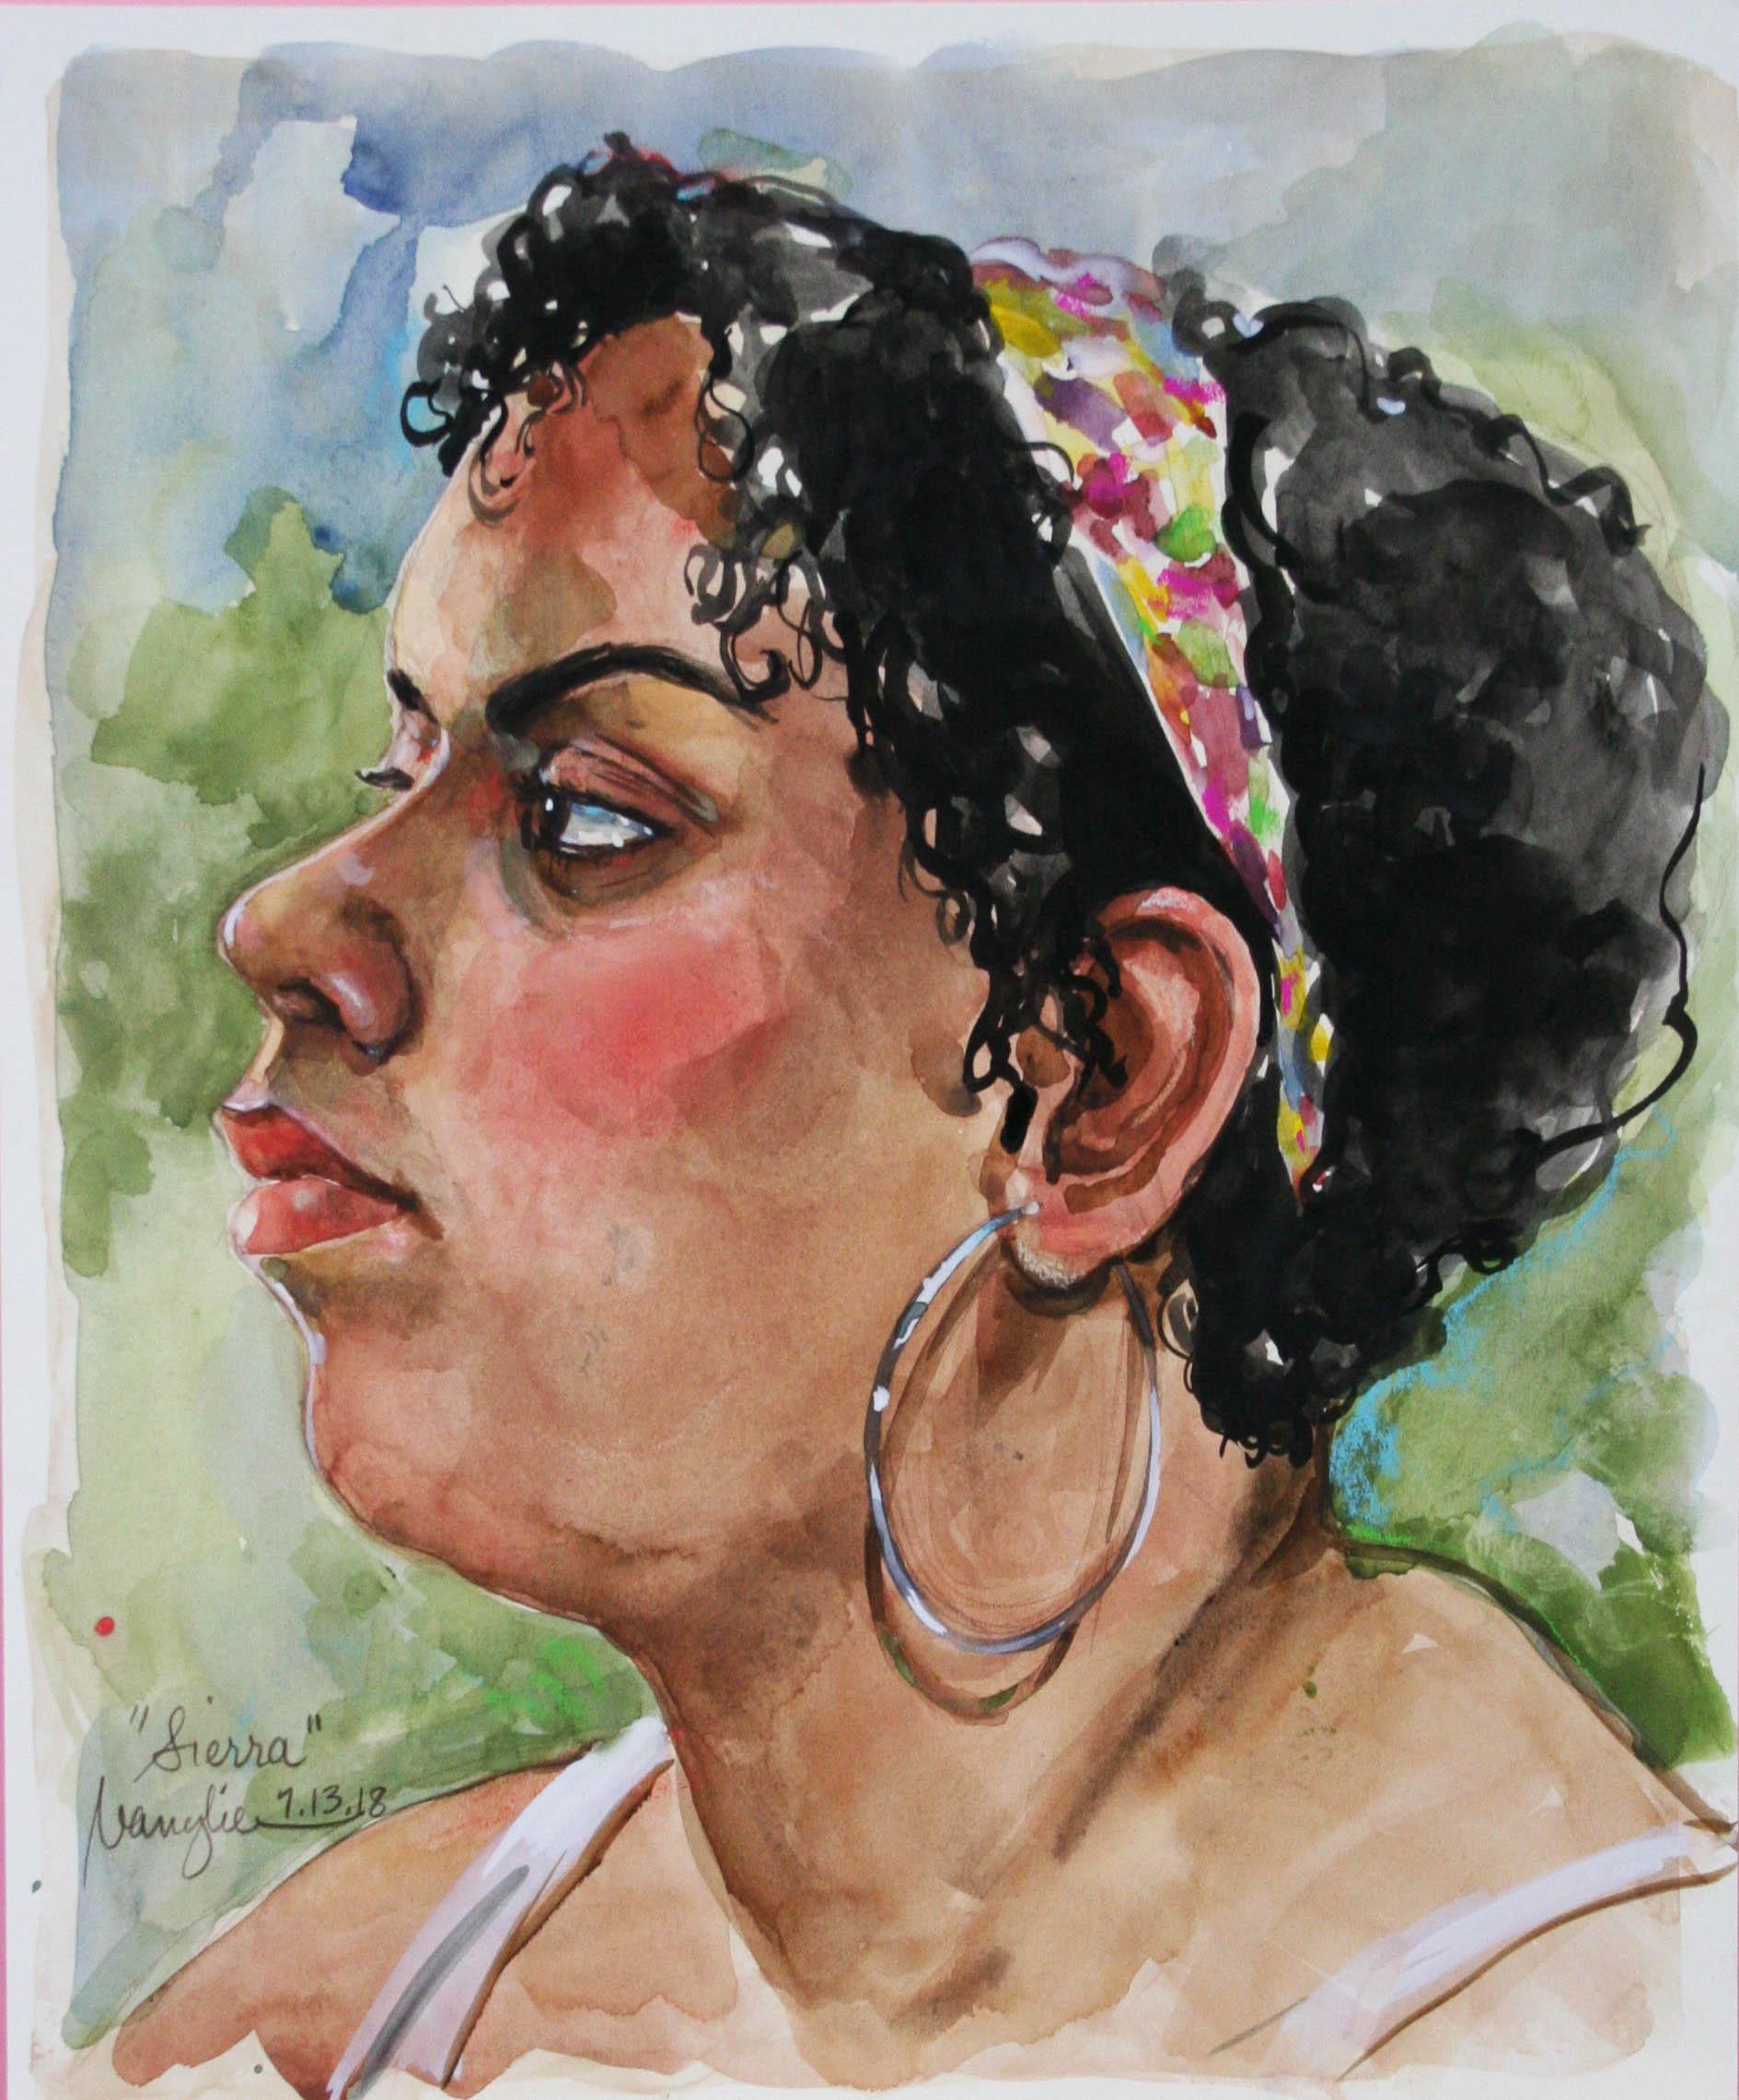 Nancy Lick did this watercolor drawing.